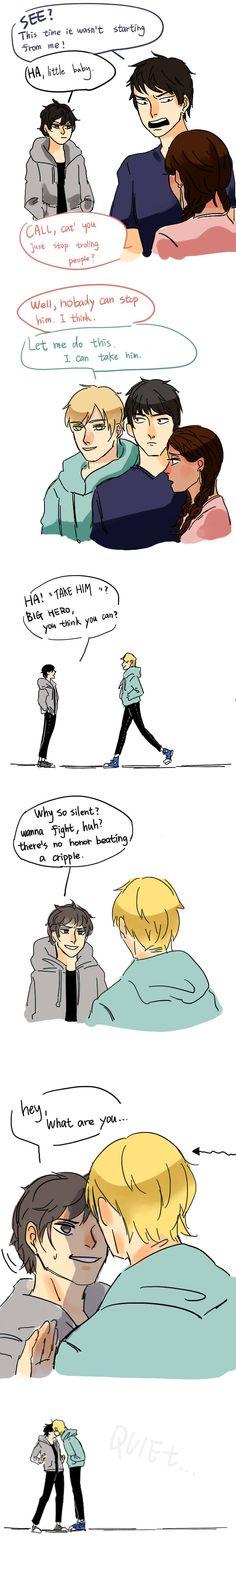 Call quiet!(English) by Yussi2251.deviantart.com on @DeviantArt